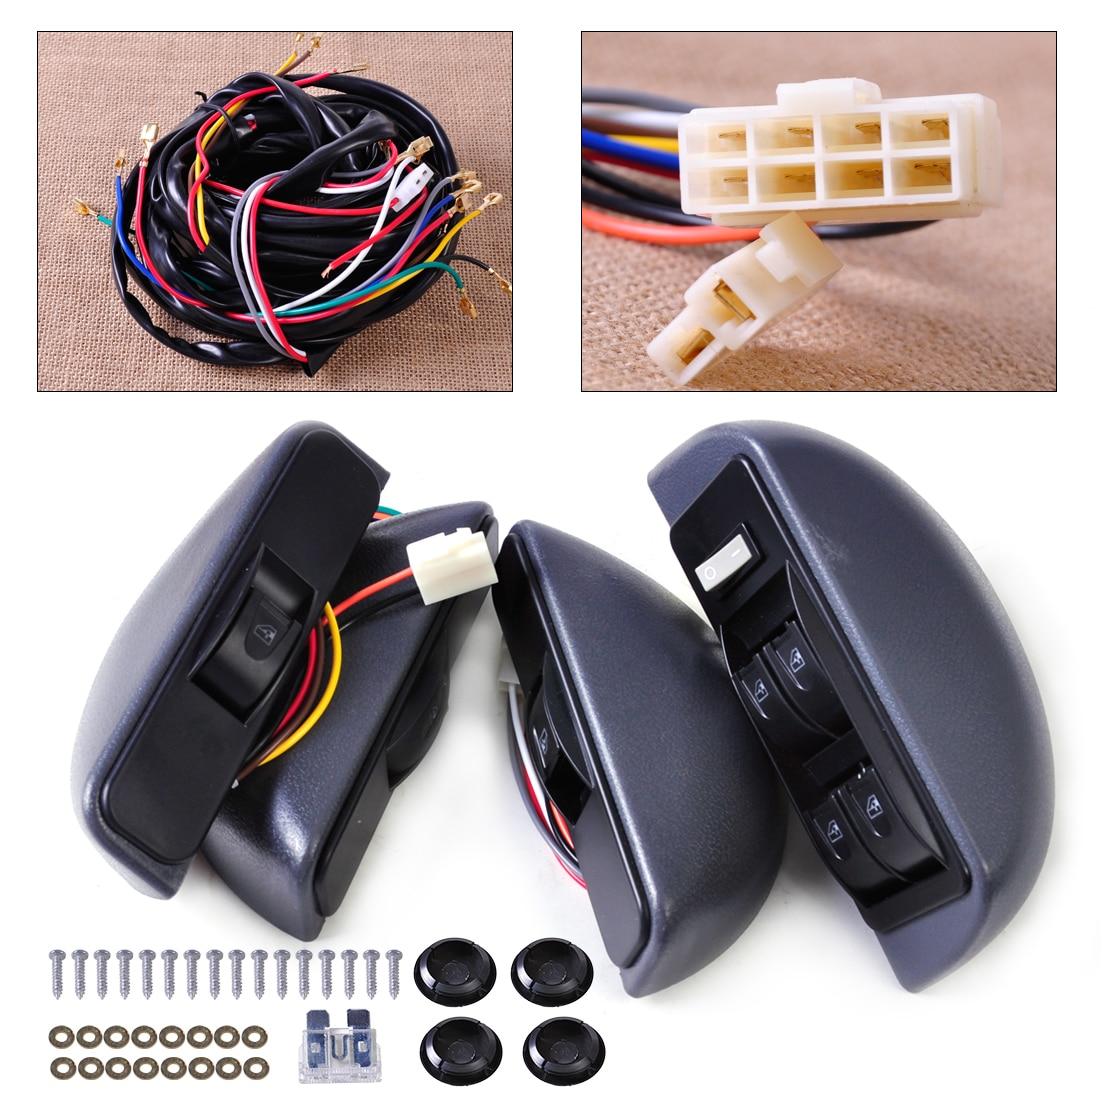 CITALL Power Window Lock Kit 4 Rocker Switch Button Window Switch 12V Car 4 Doors For Ford Hyundai Nissan Chevrolet Honda